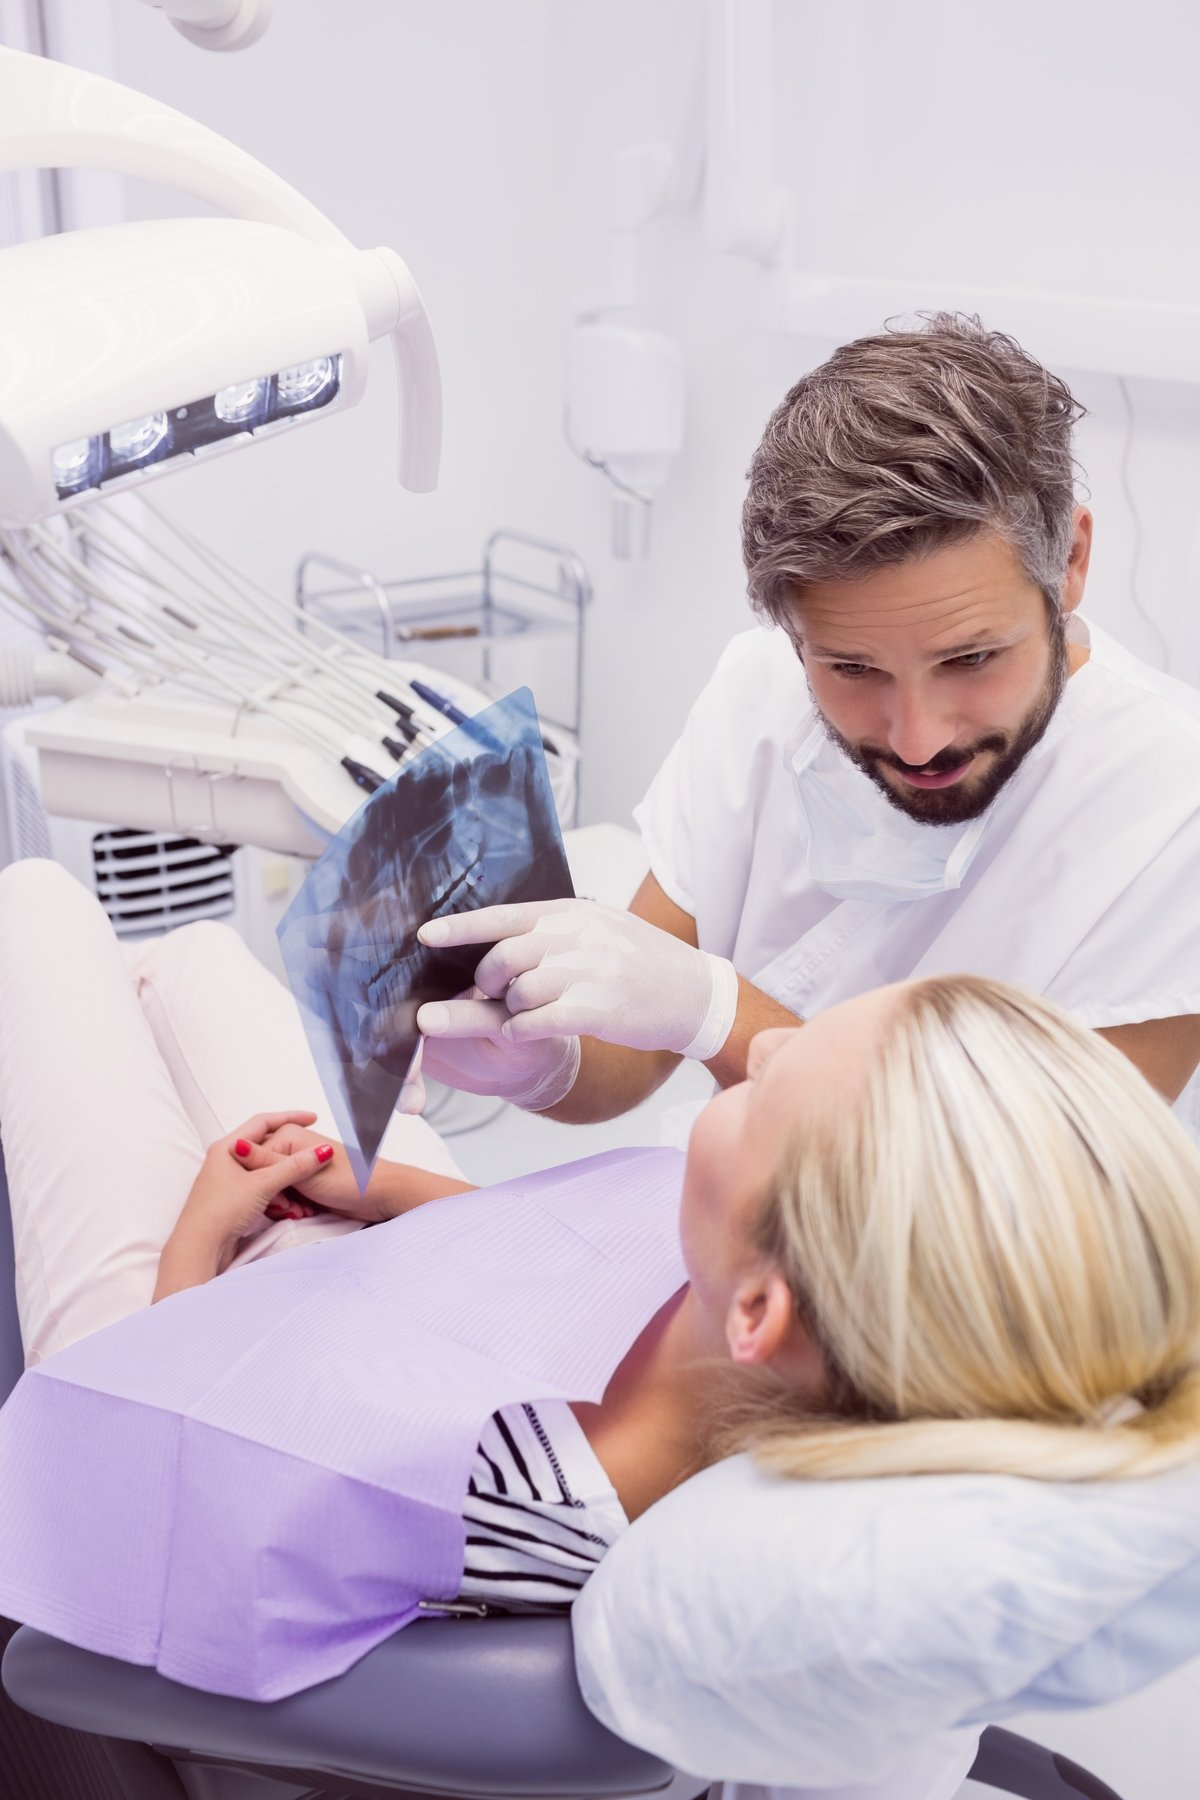 paradontologija-dentalna_veja_medicine_drcuratis